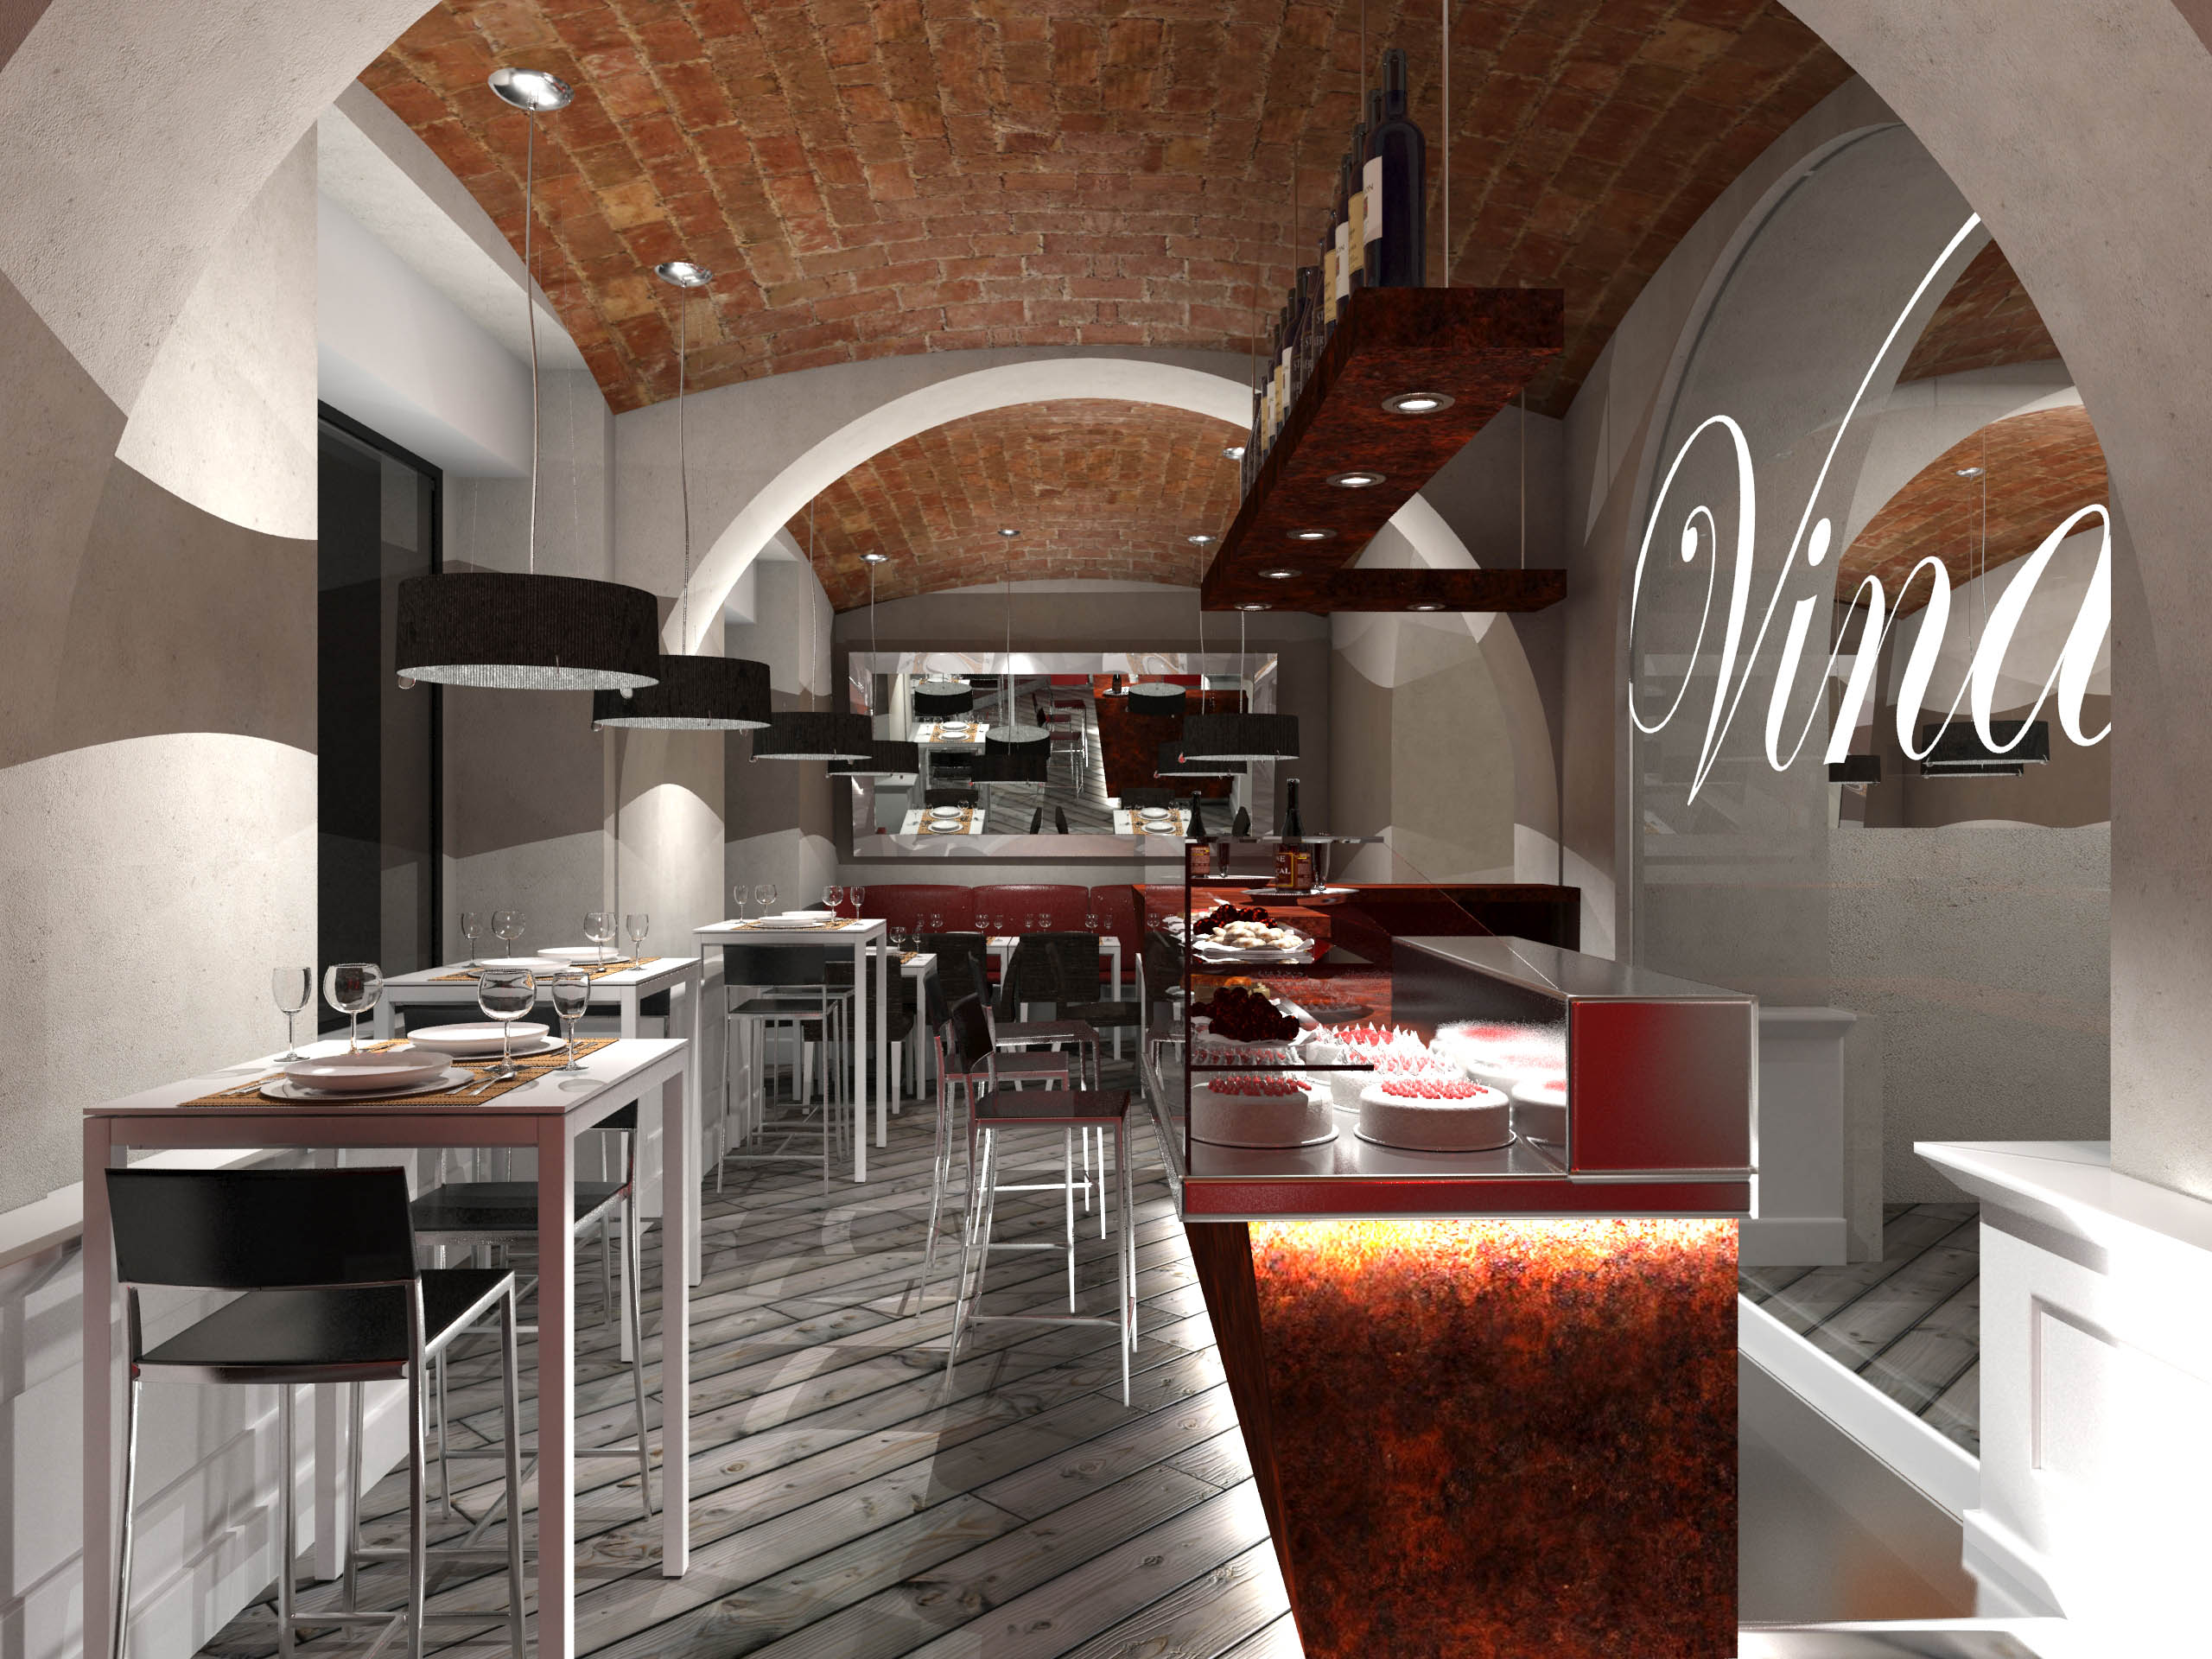 301 moved permanently for Architetto interni roma